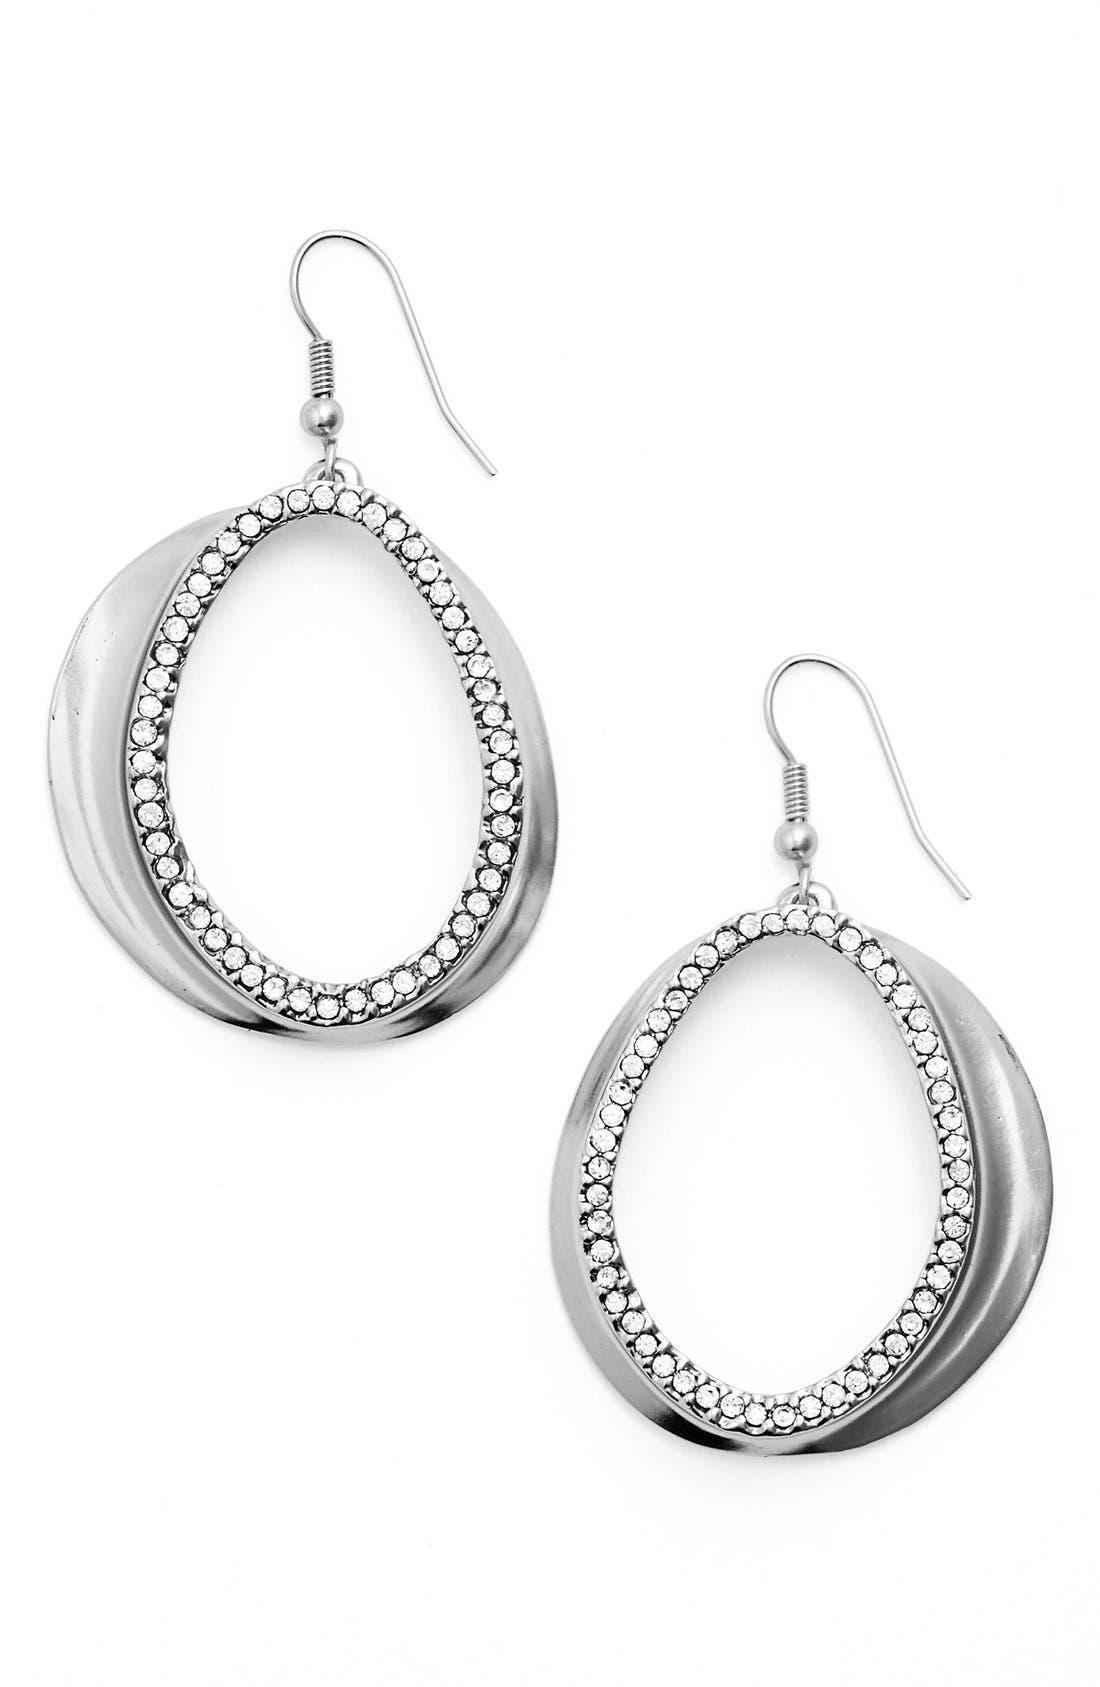 Crystal Front Hoop Earrings,                             Main thumbnail 1, color,                             Silver